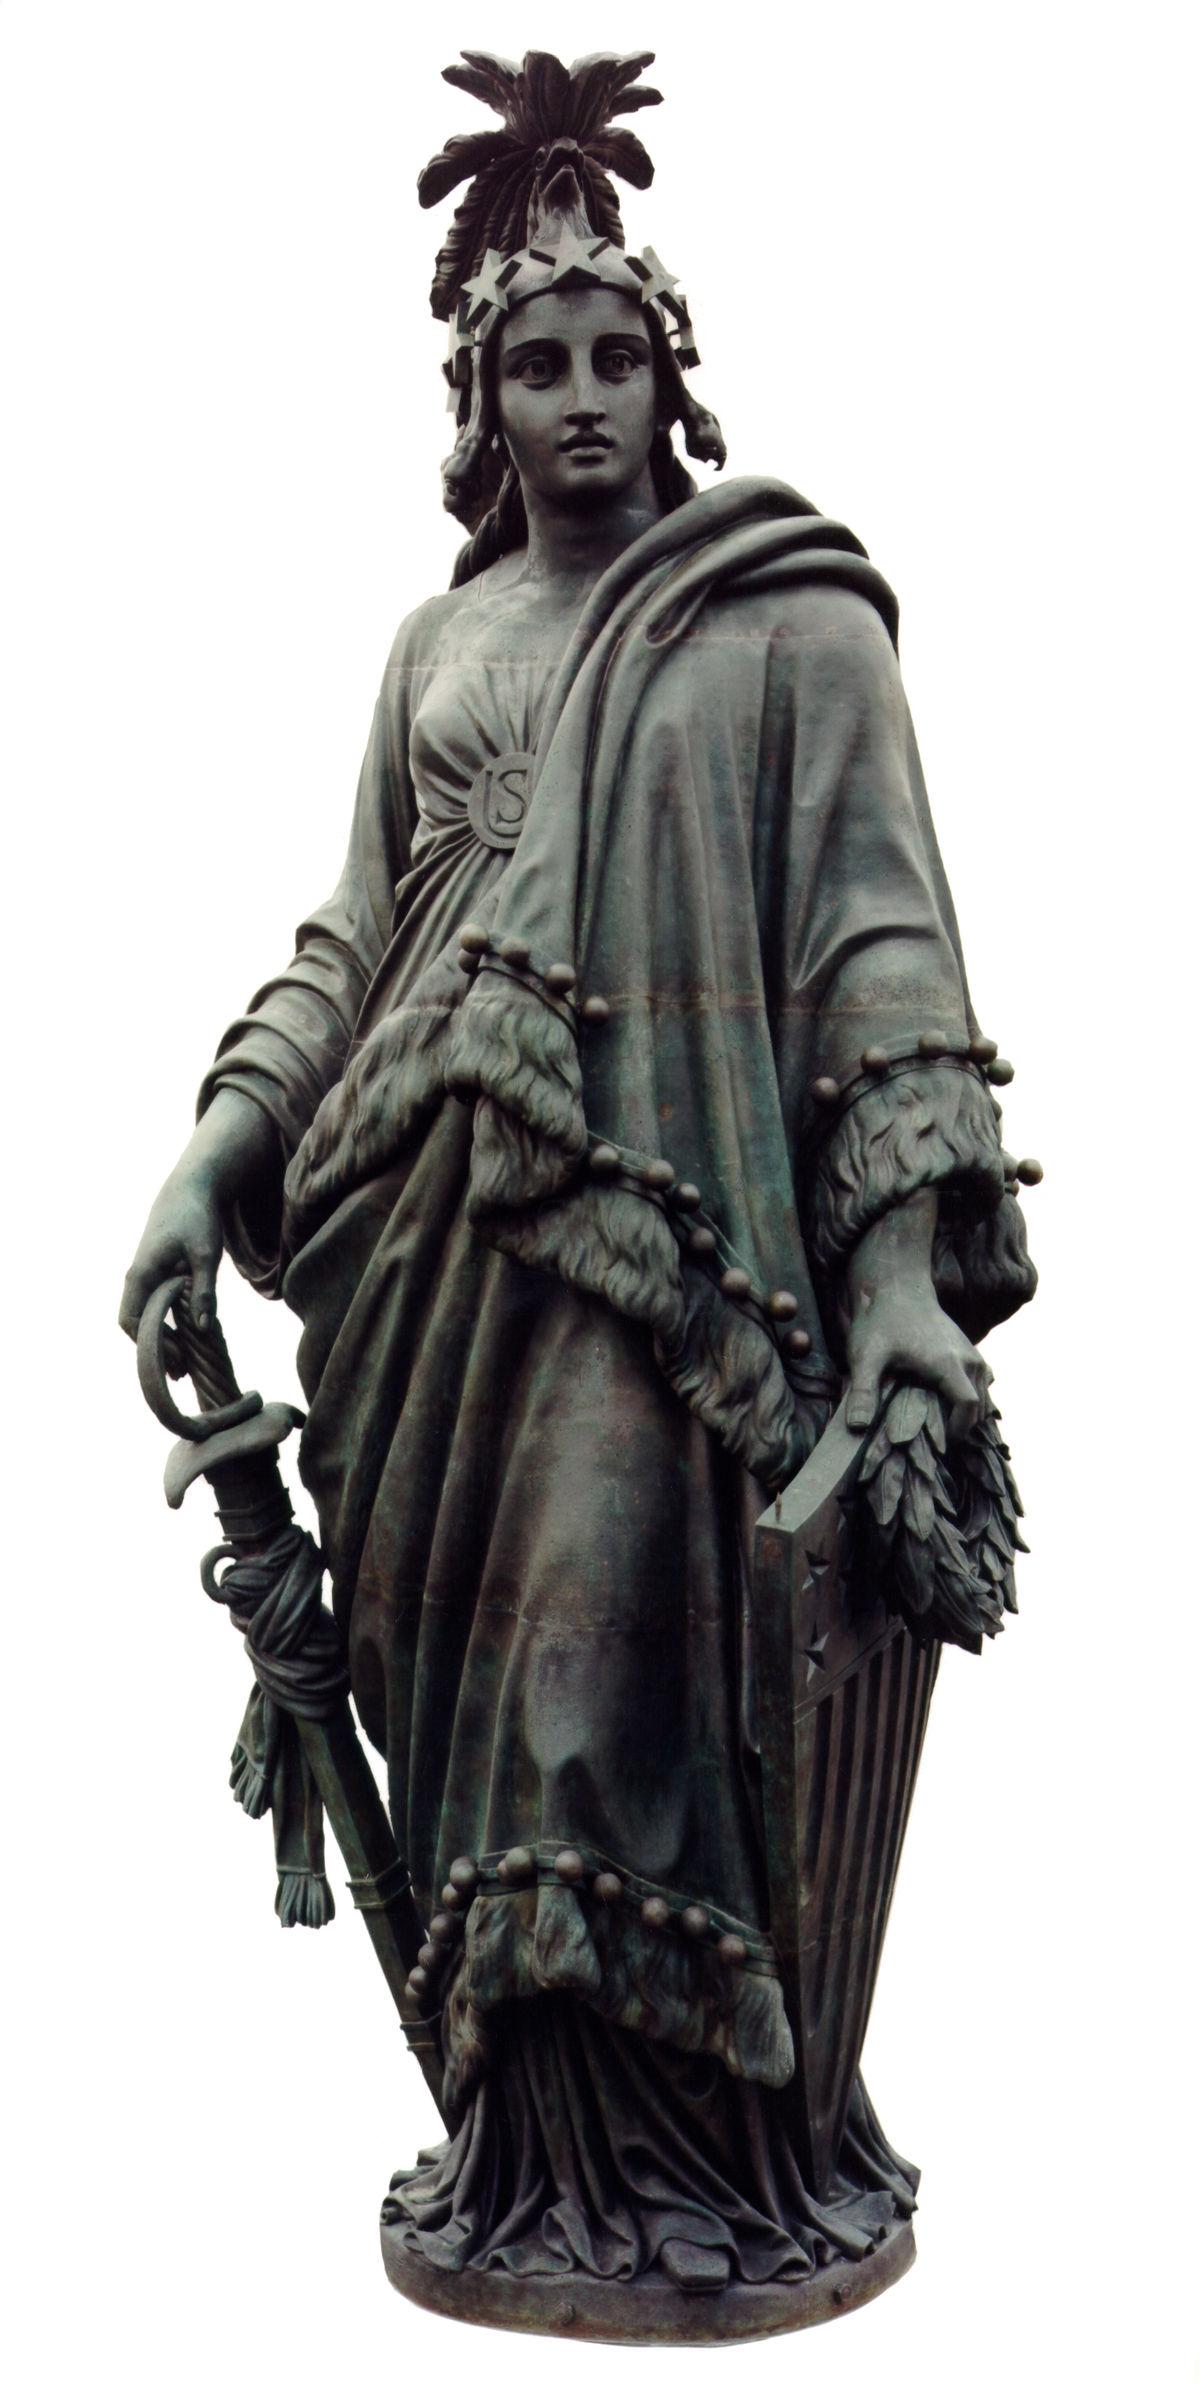 metaux/images/statue_bronze.jpg